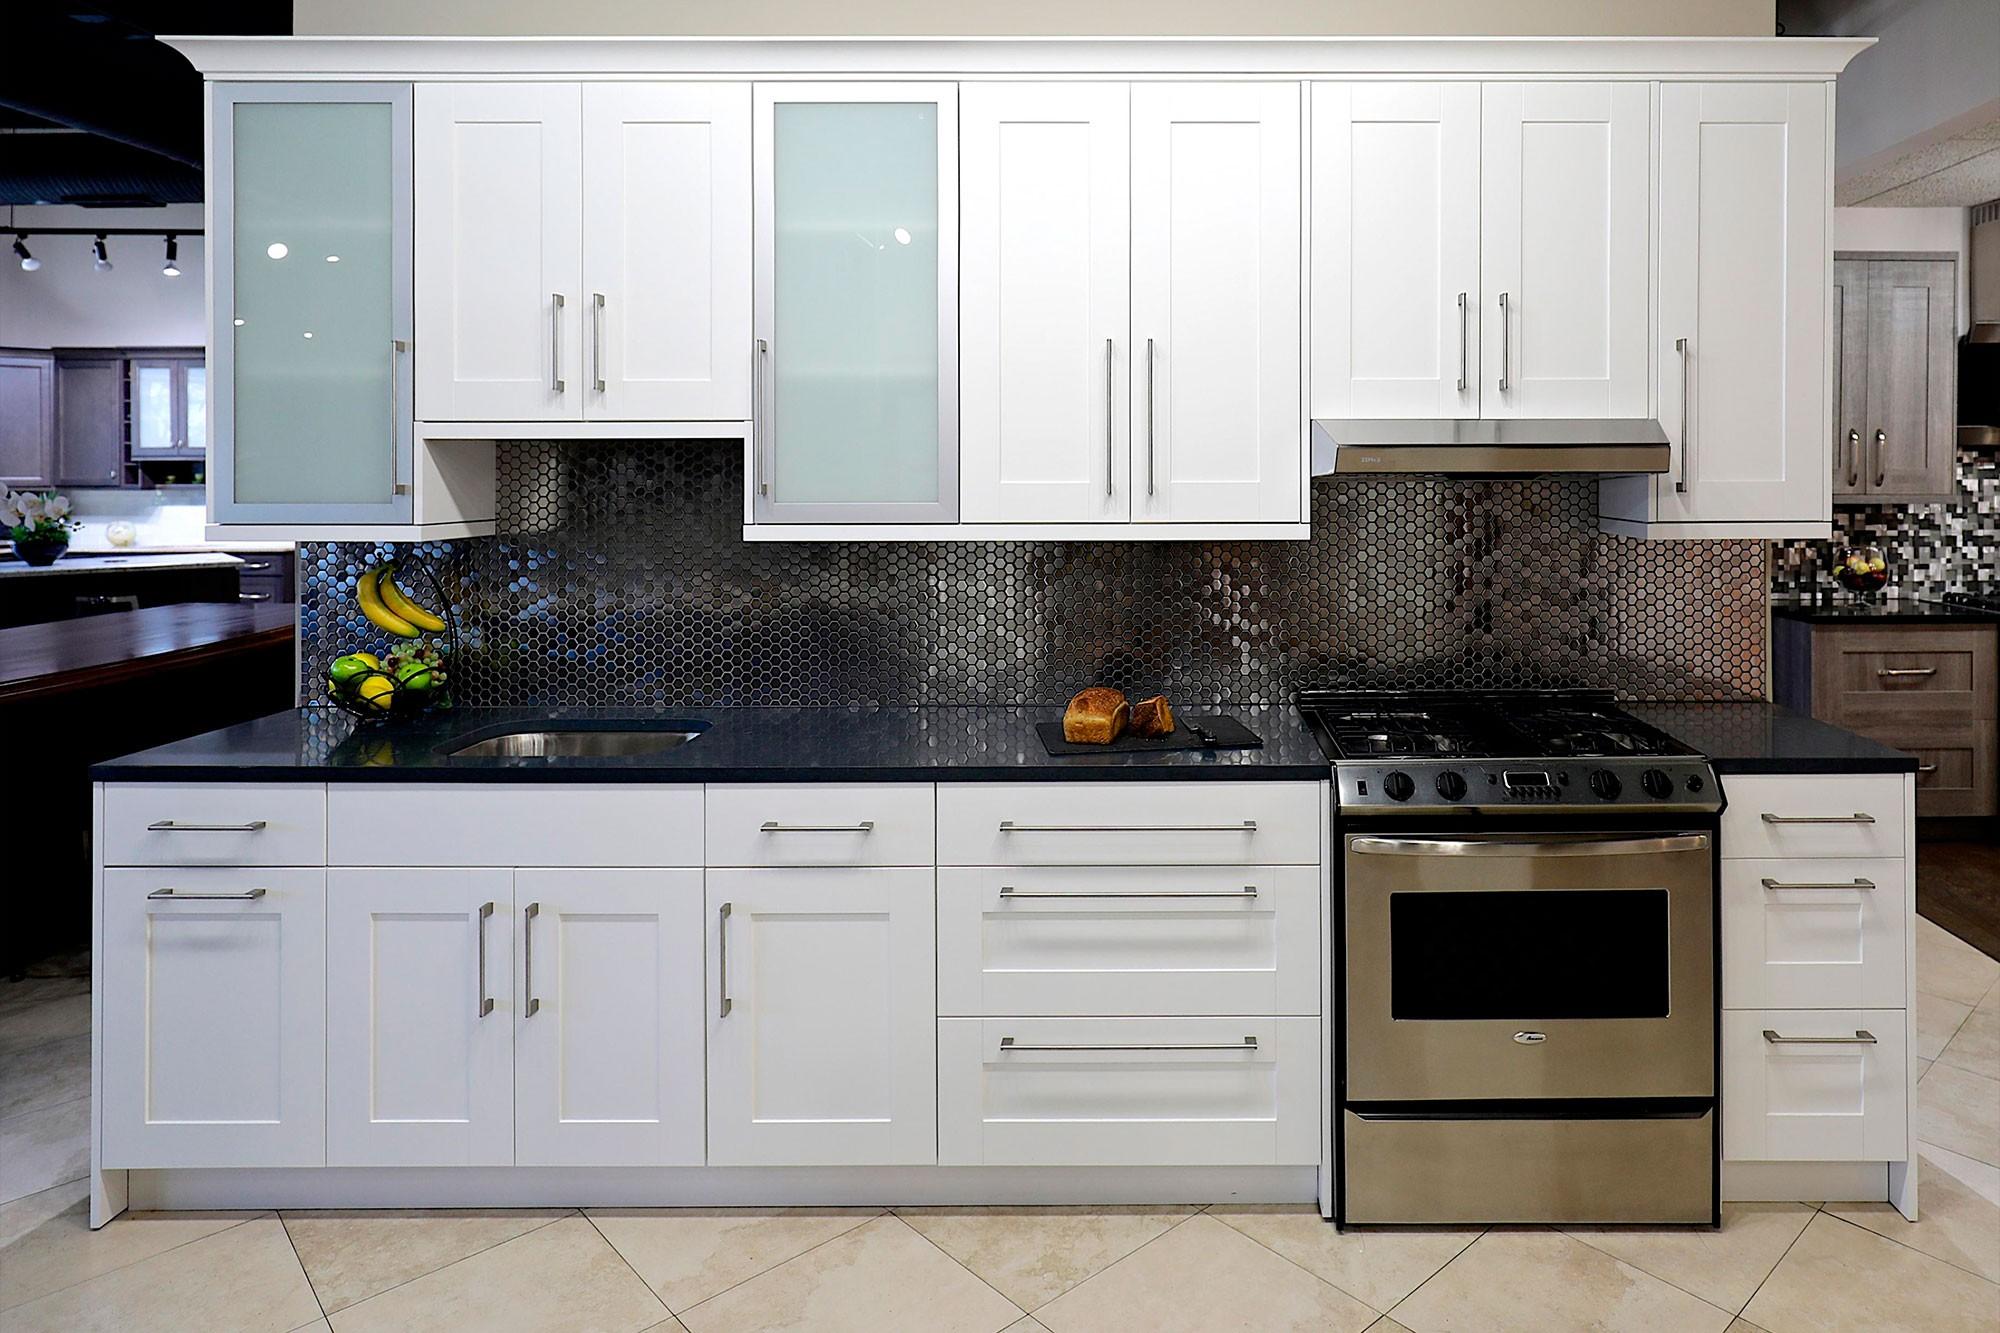 shaker kitchen cabinets white sink undermount bianca bath bathroom stock showroom